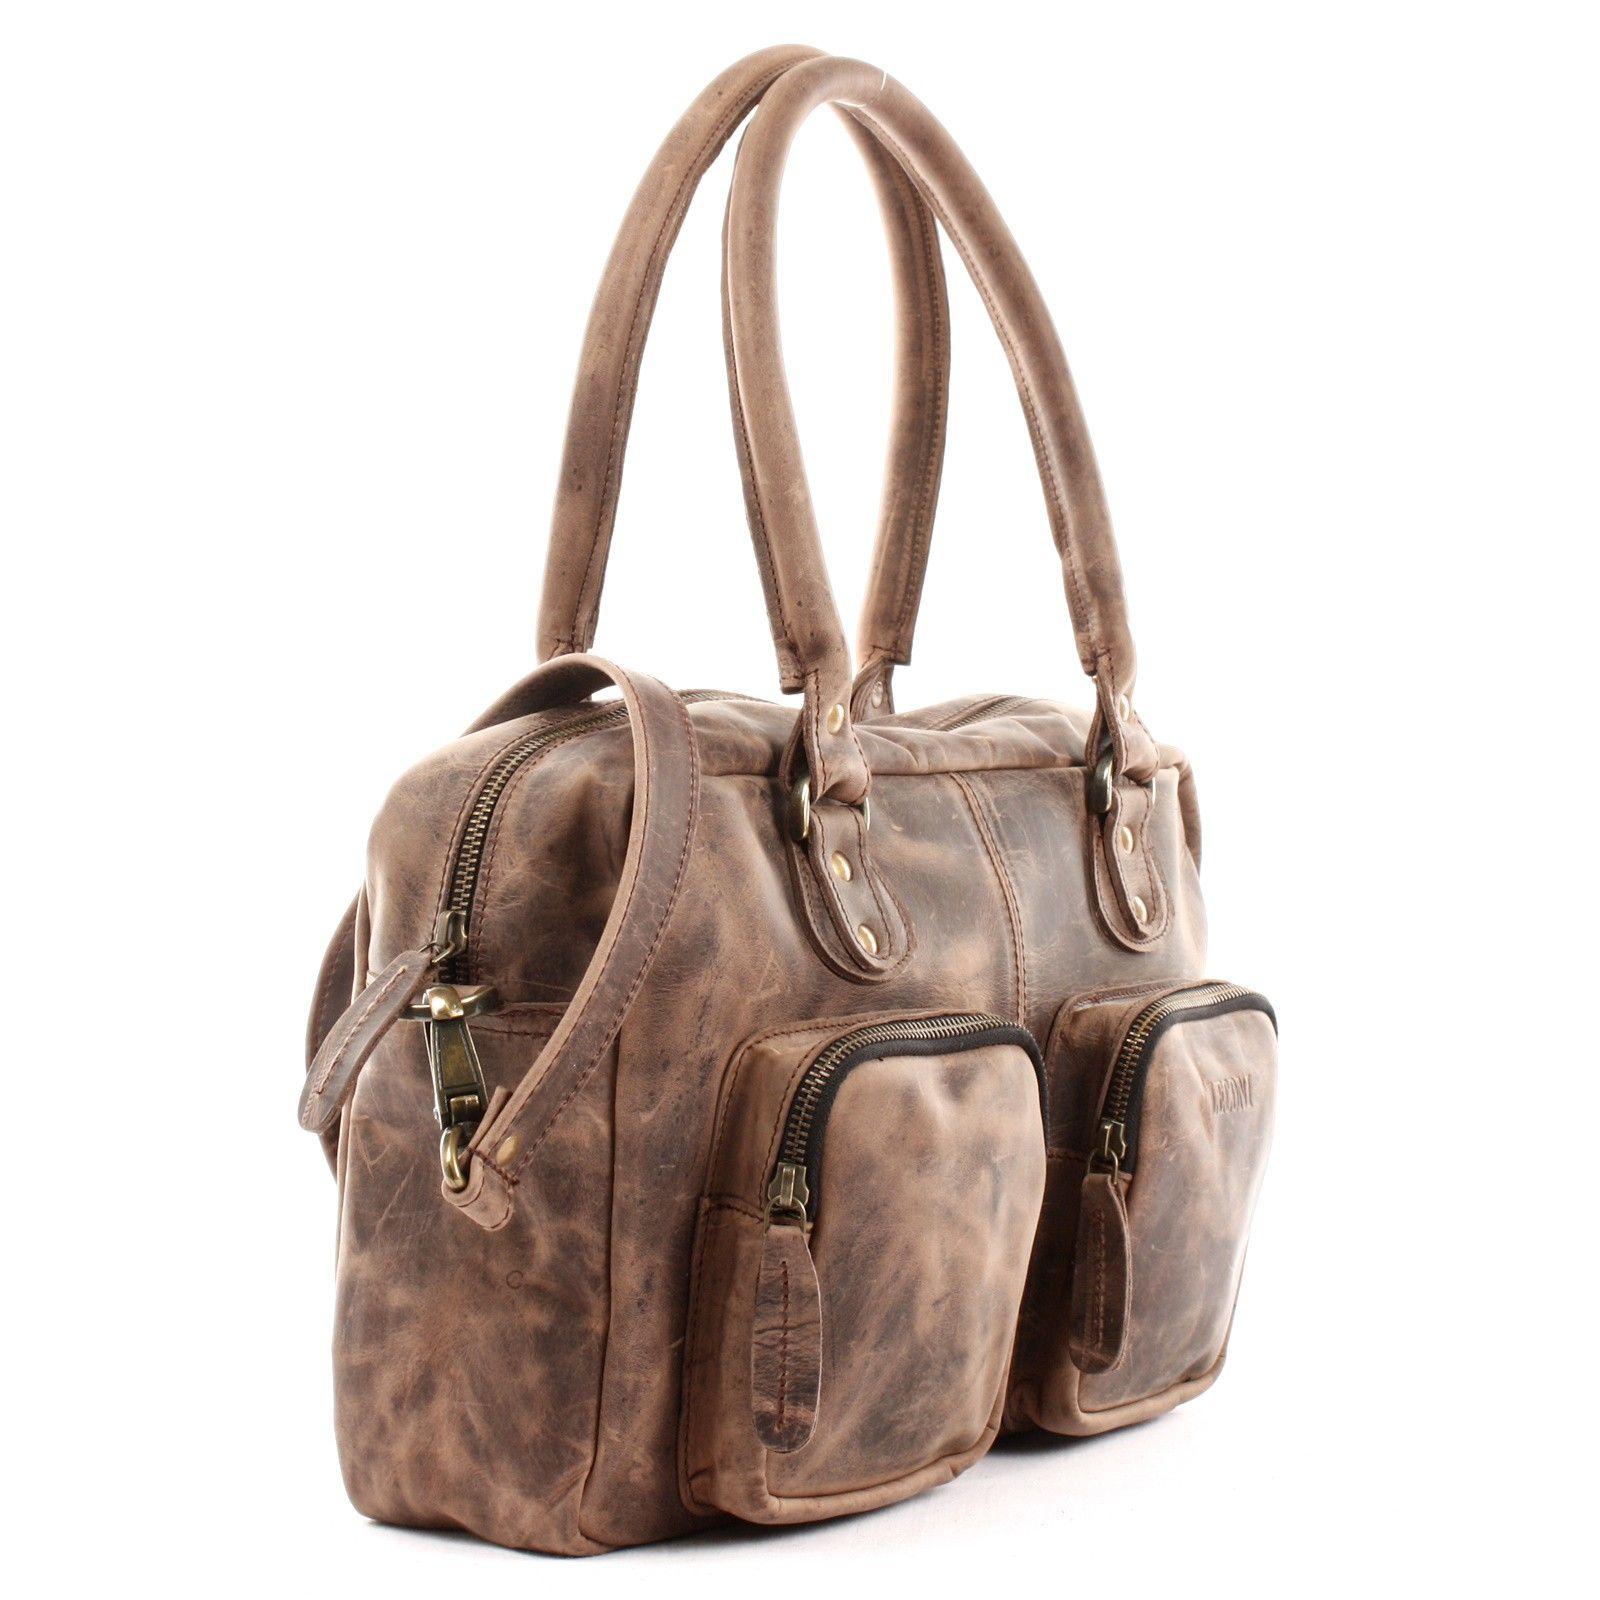 f9a4905d9cd62 LECONI Schultertasche Handtasche Leder schlamm LE0046